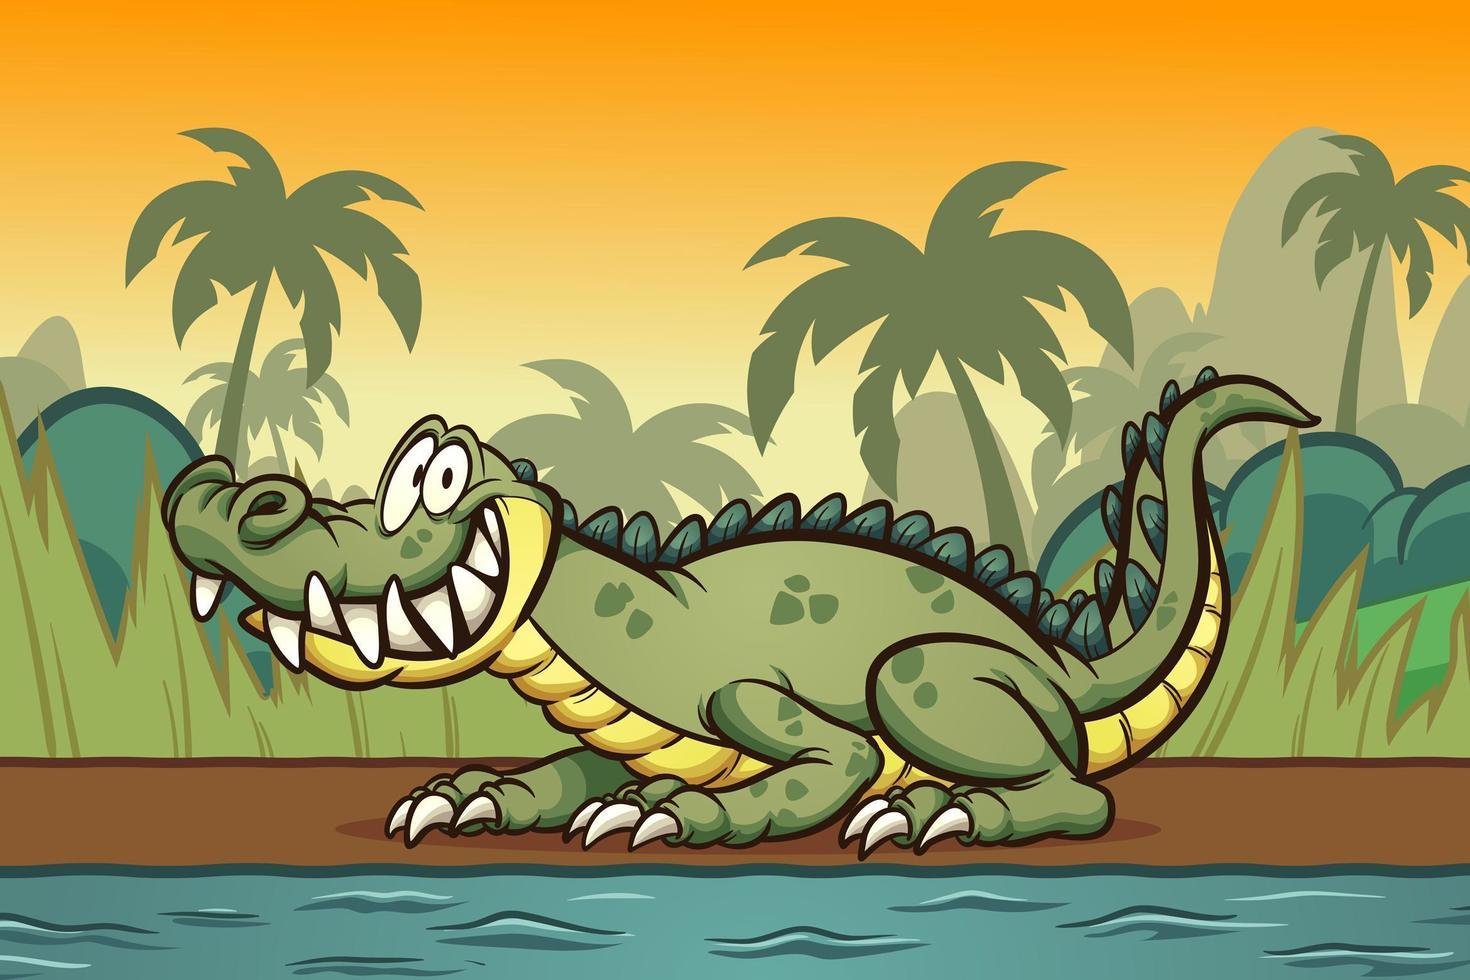 crocodilo de desenhos animados na costa do rio vetor